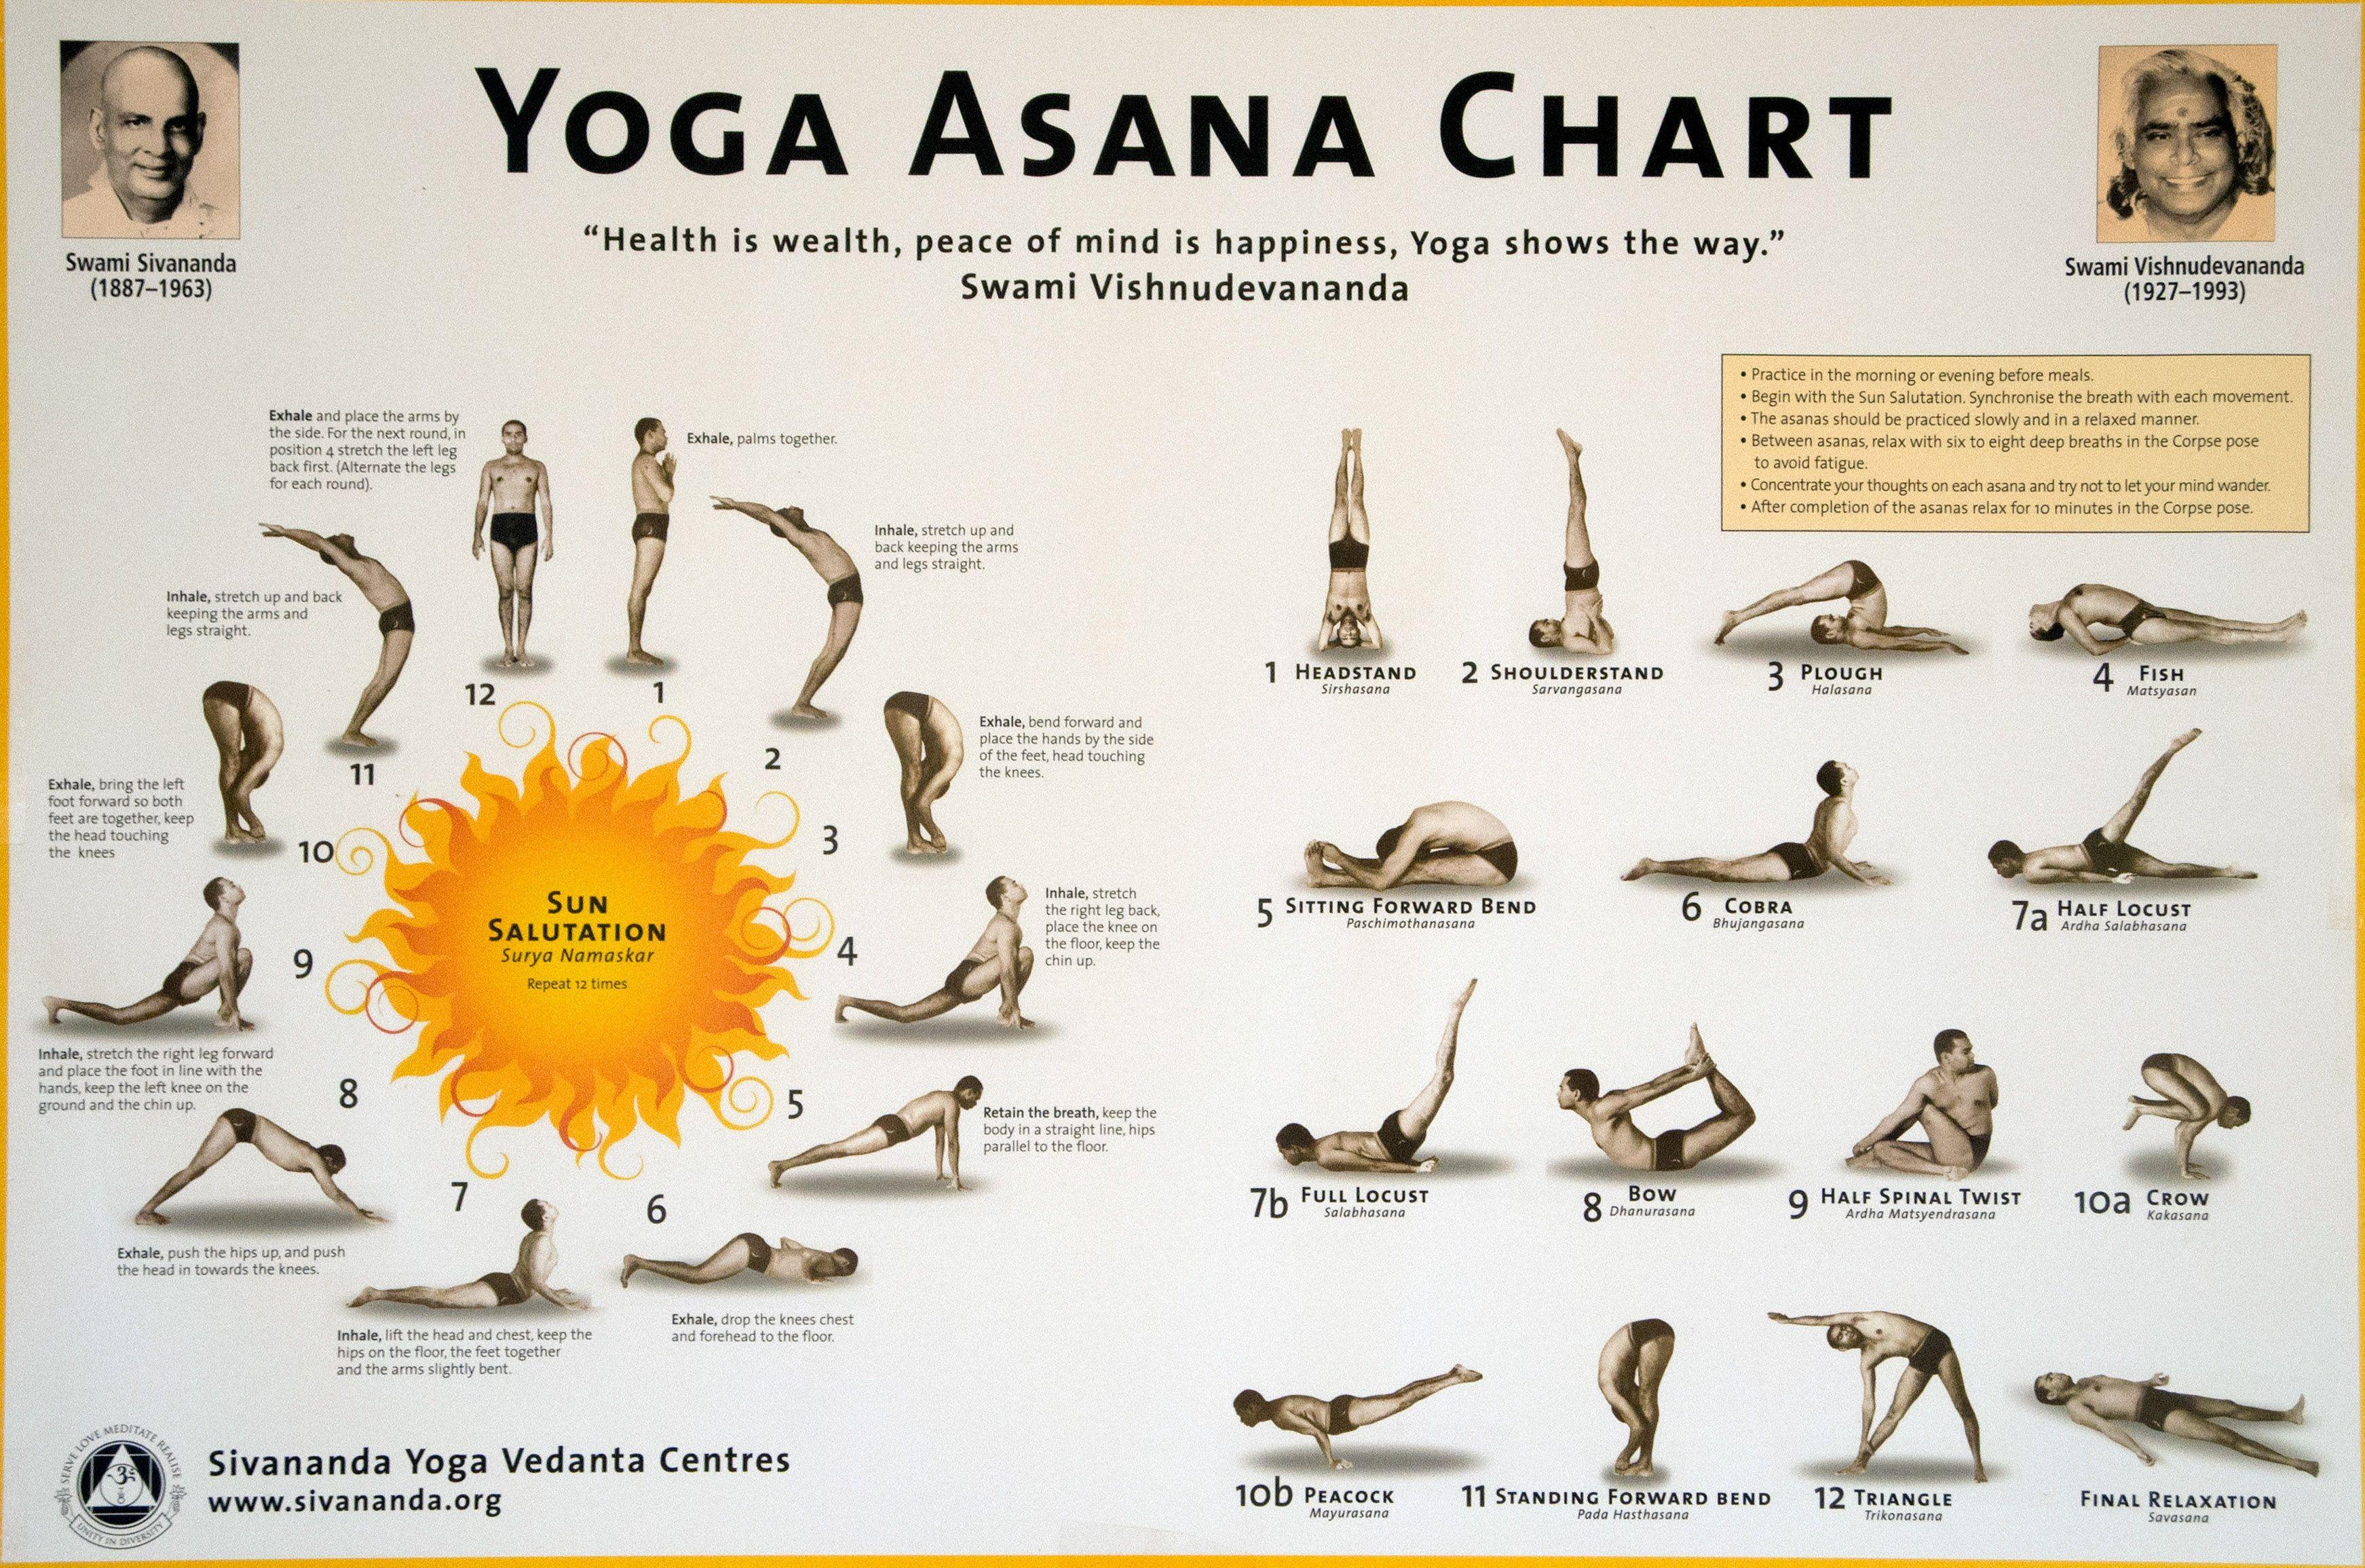 Асаны йоги в картинках стоять на часах